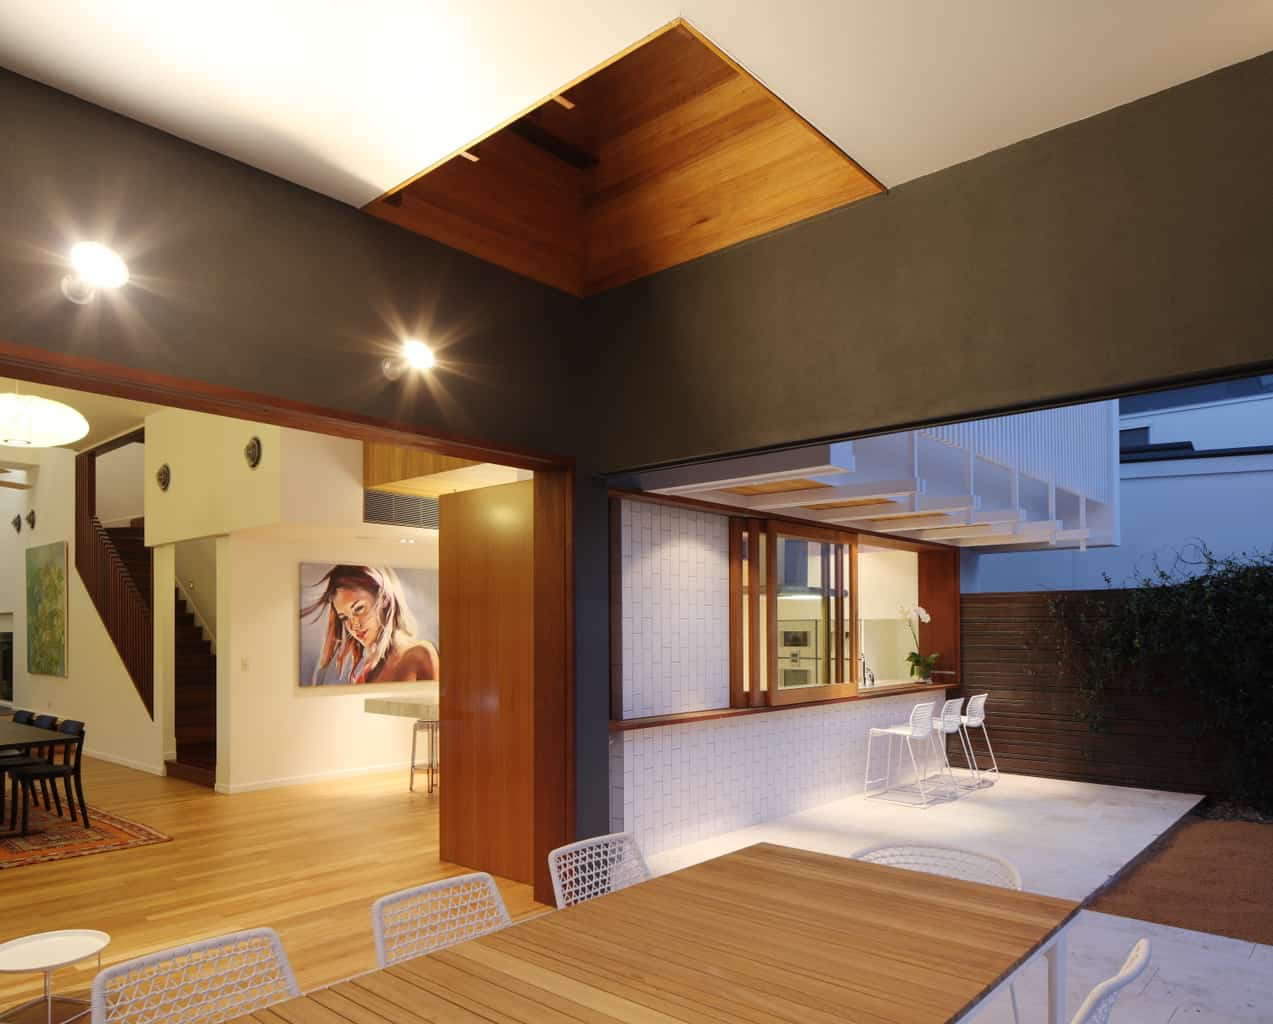 Inner-city Brisbane architecture: the Park House